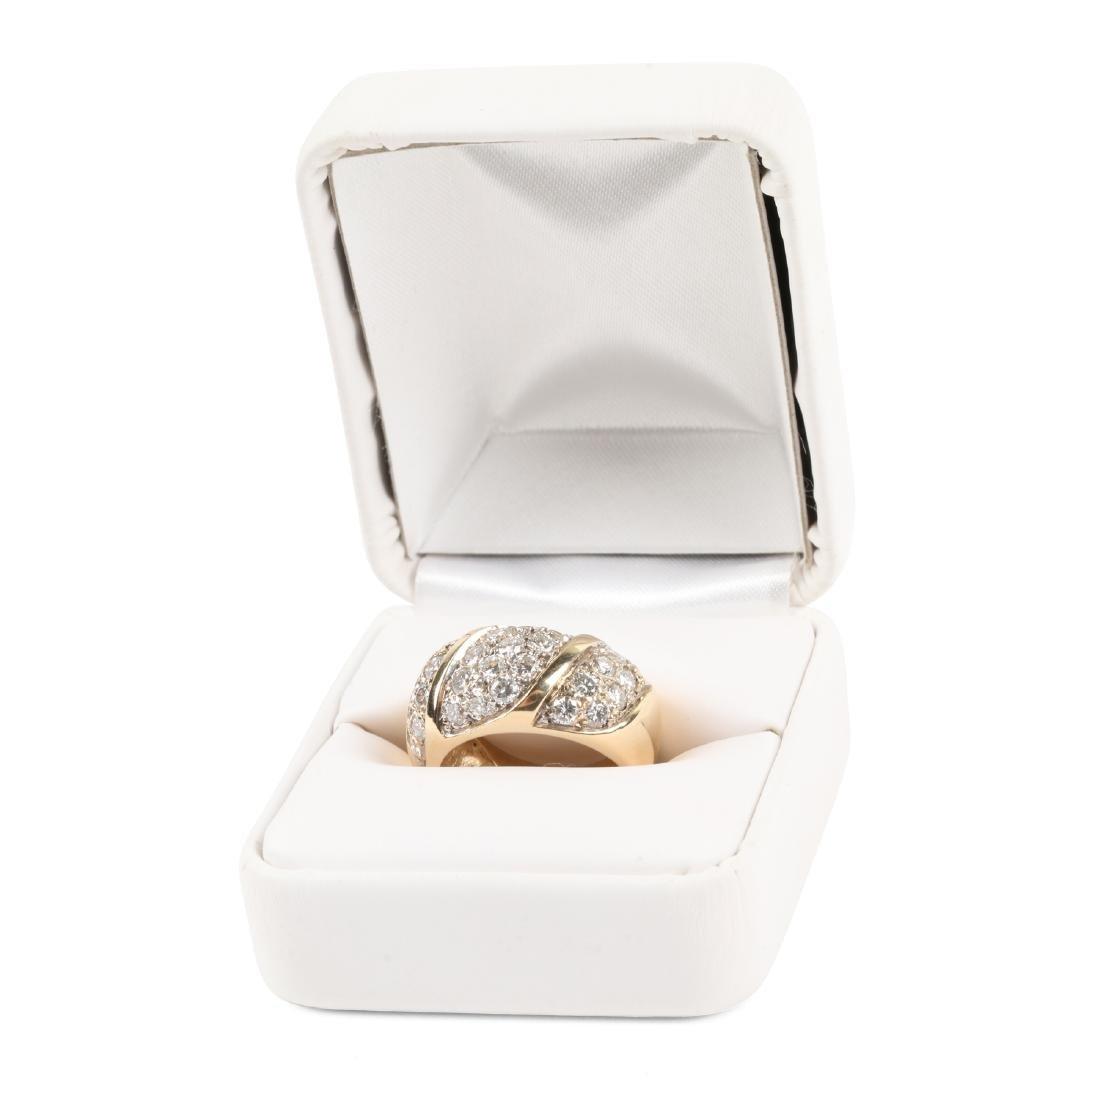 A 14K Yellow Gold, Diamond Ring